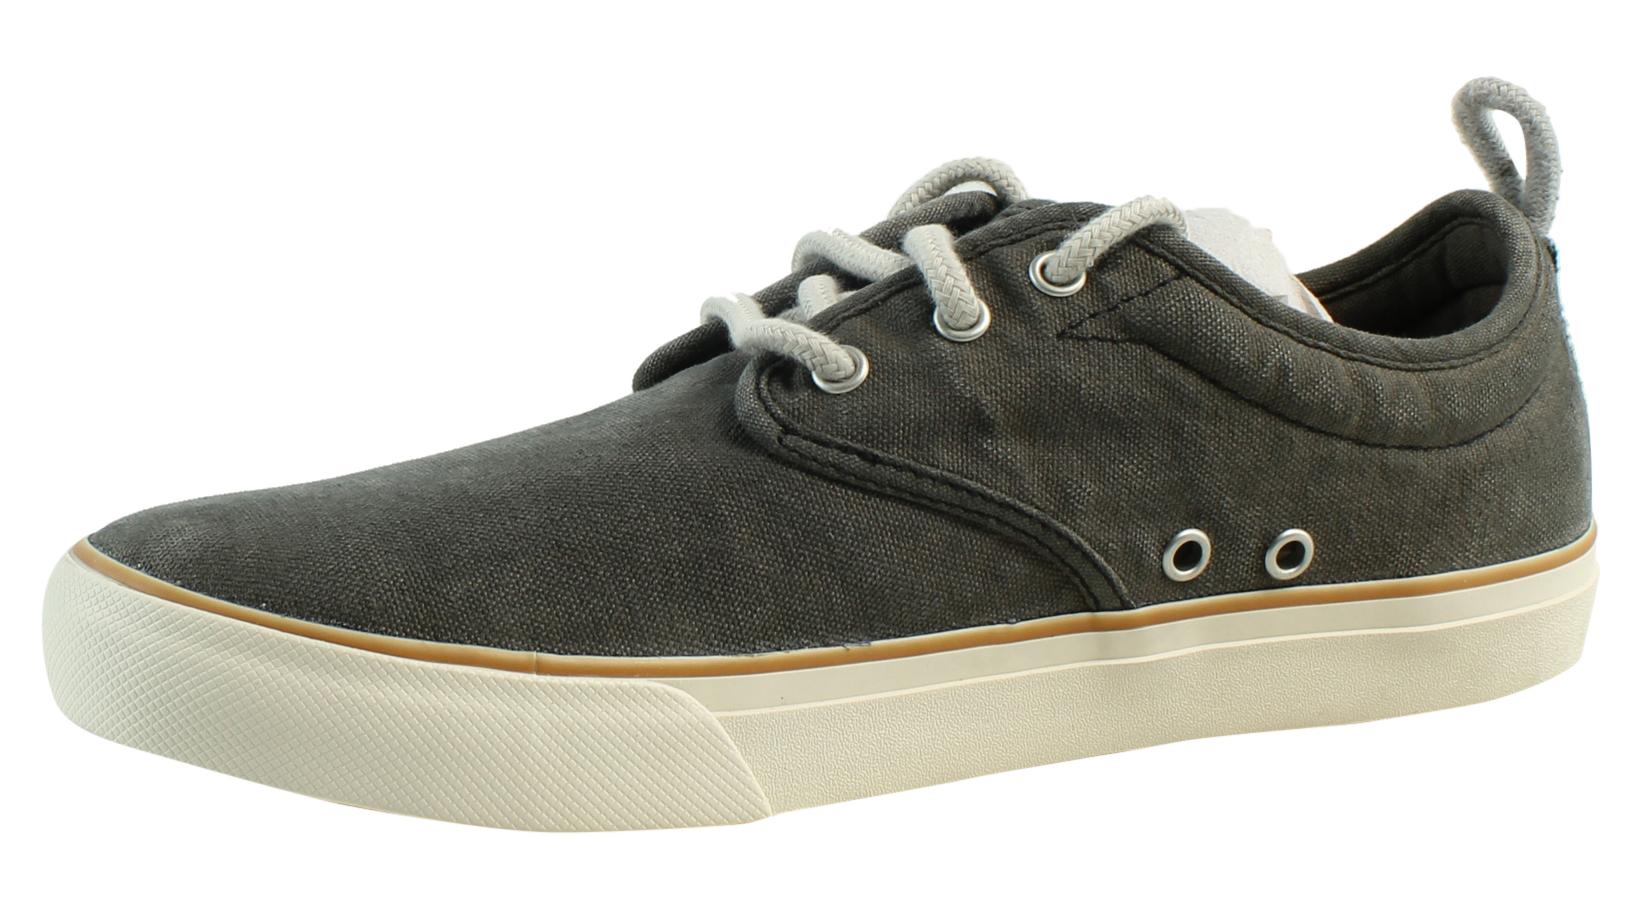 sports shoes e3b0e 2da11 ... New Sanuk Mens 1016635 1016635 1016635 WashedBlack Fashion Shoes Size 7  e01f59 ...